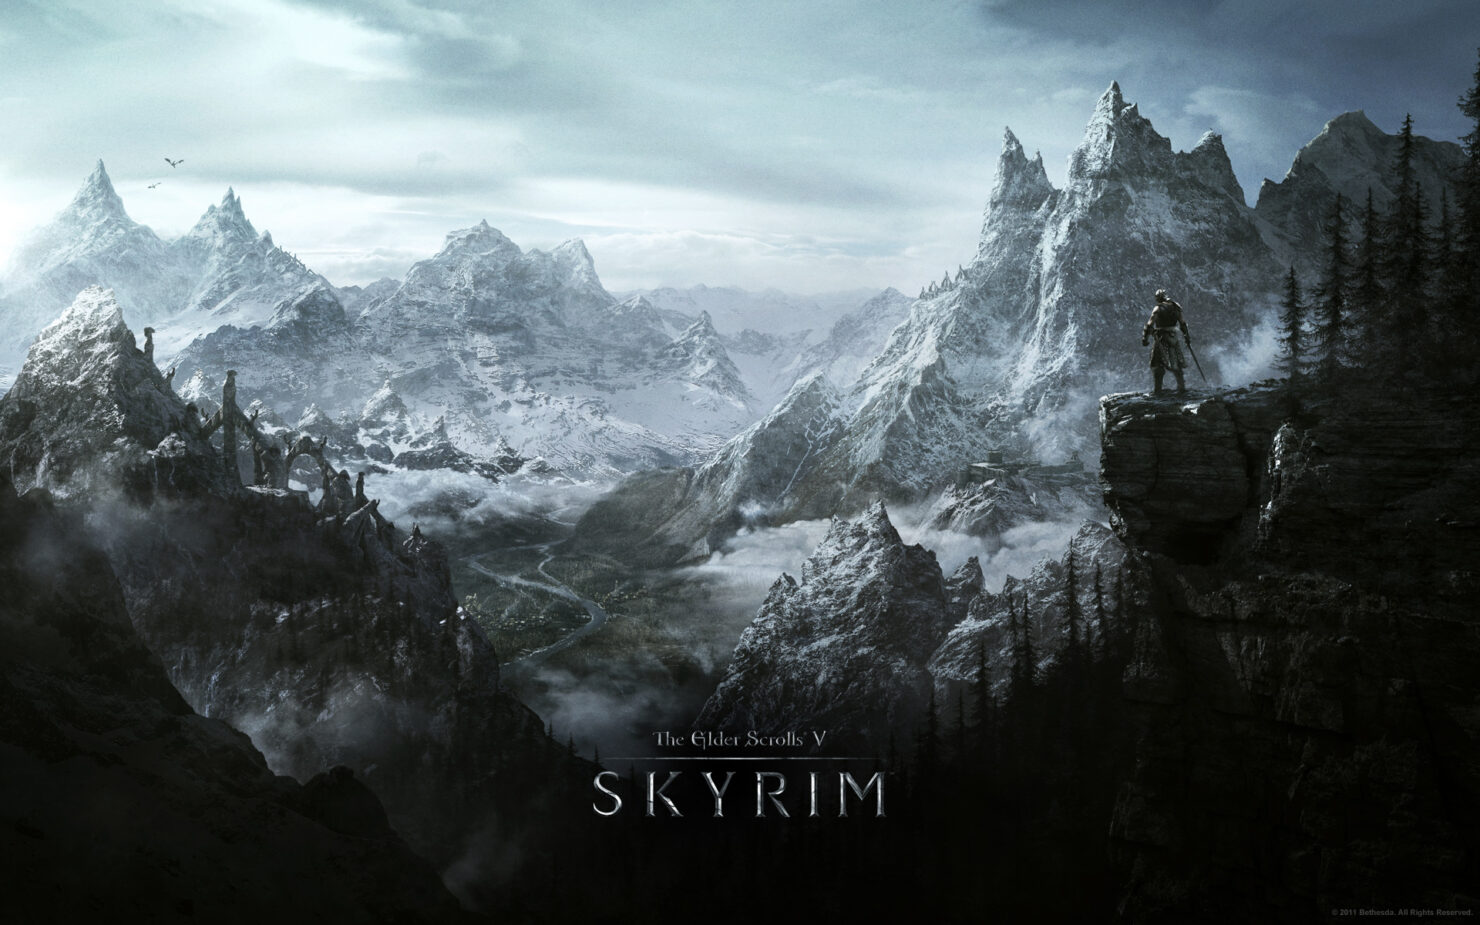 skyrim special edition update 1.3